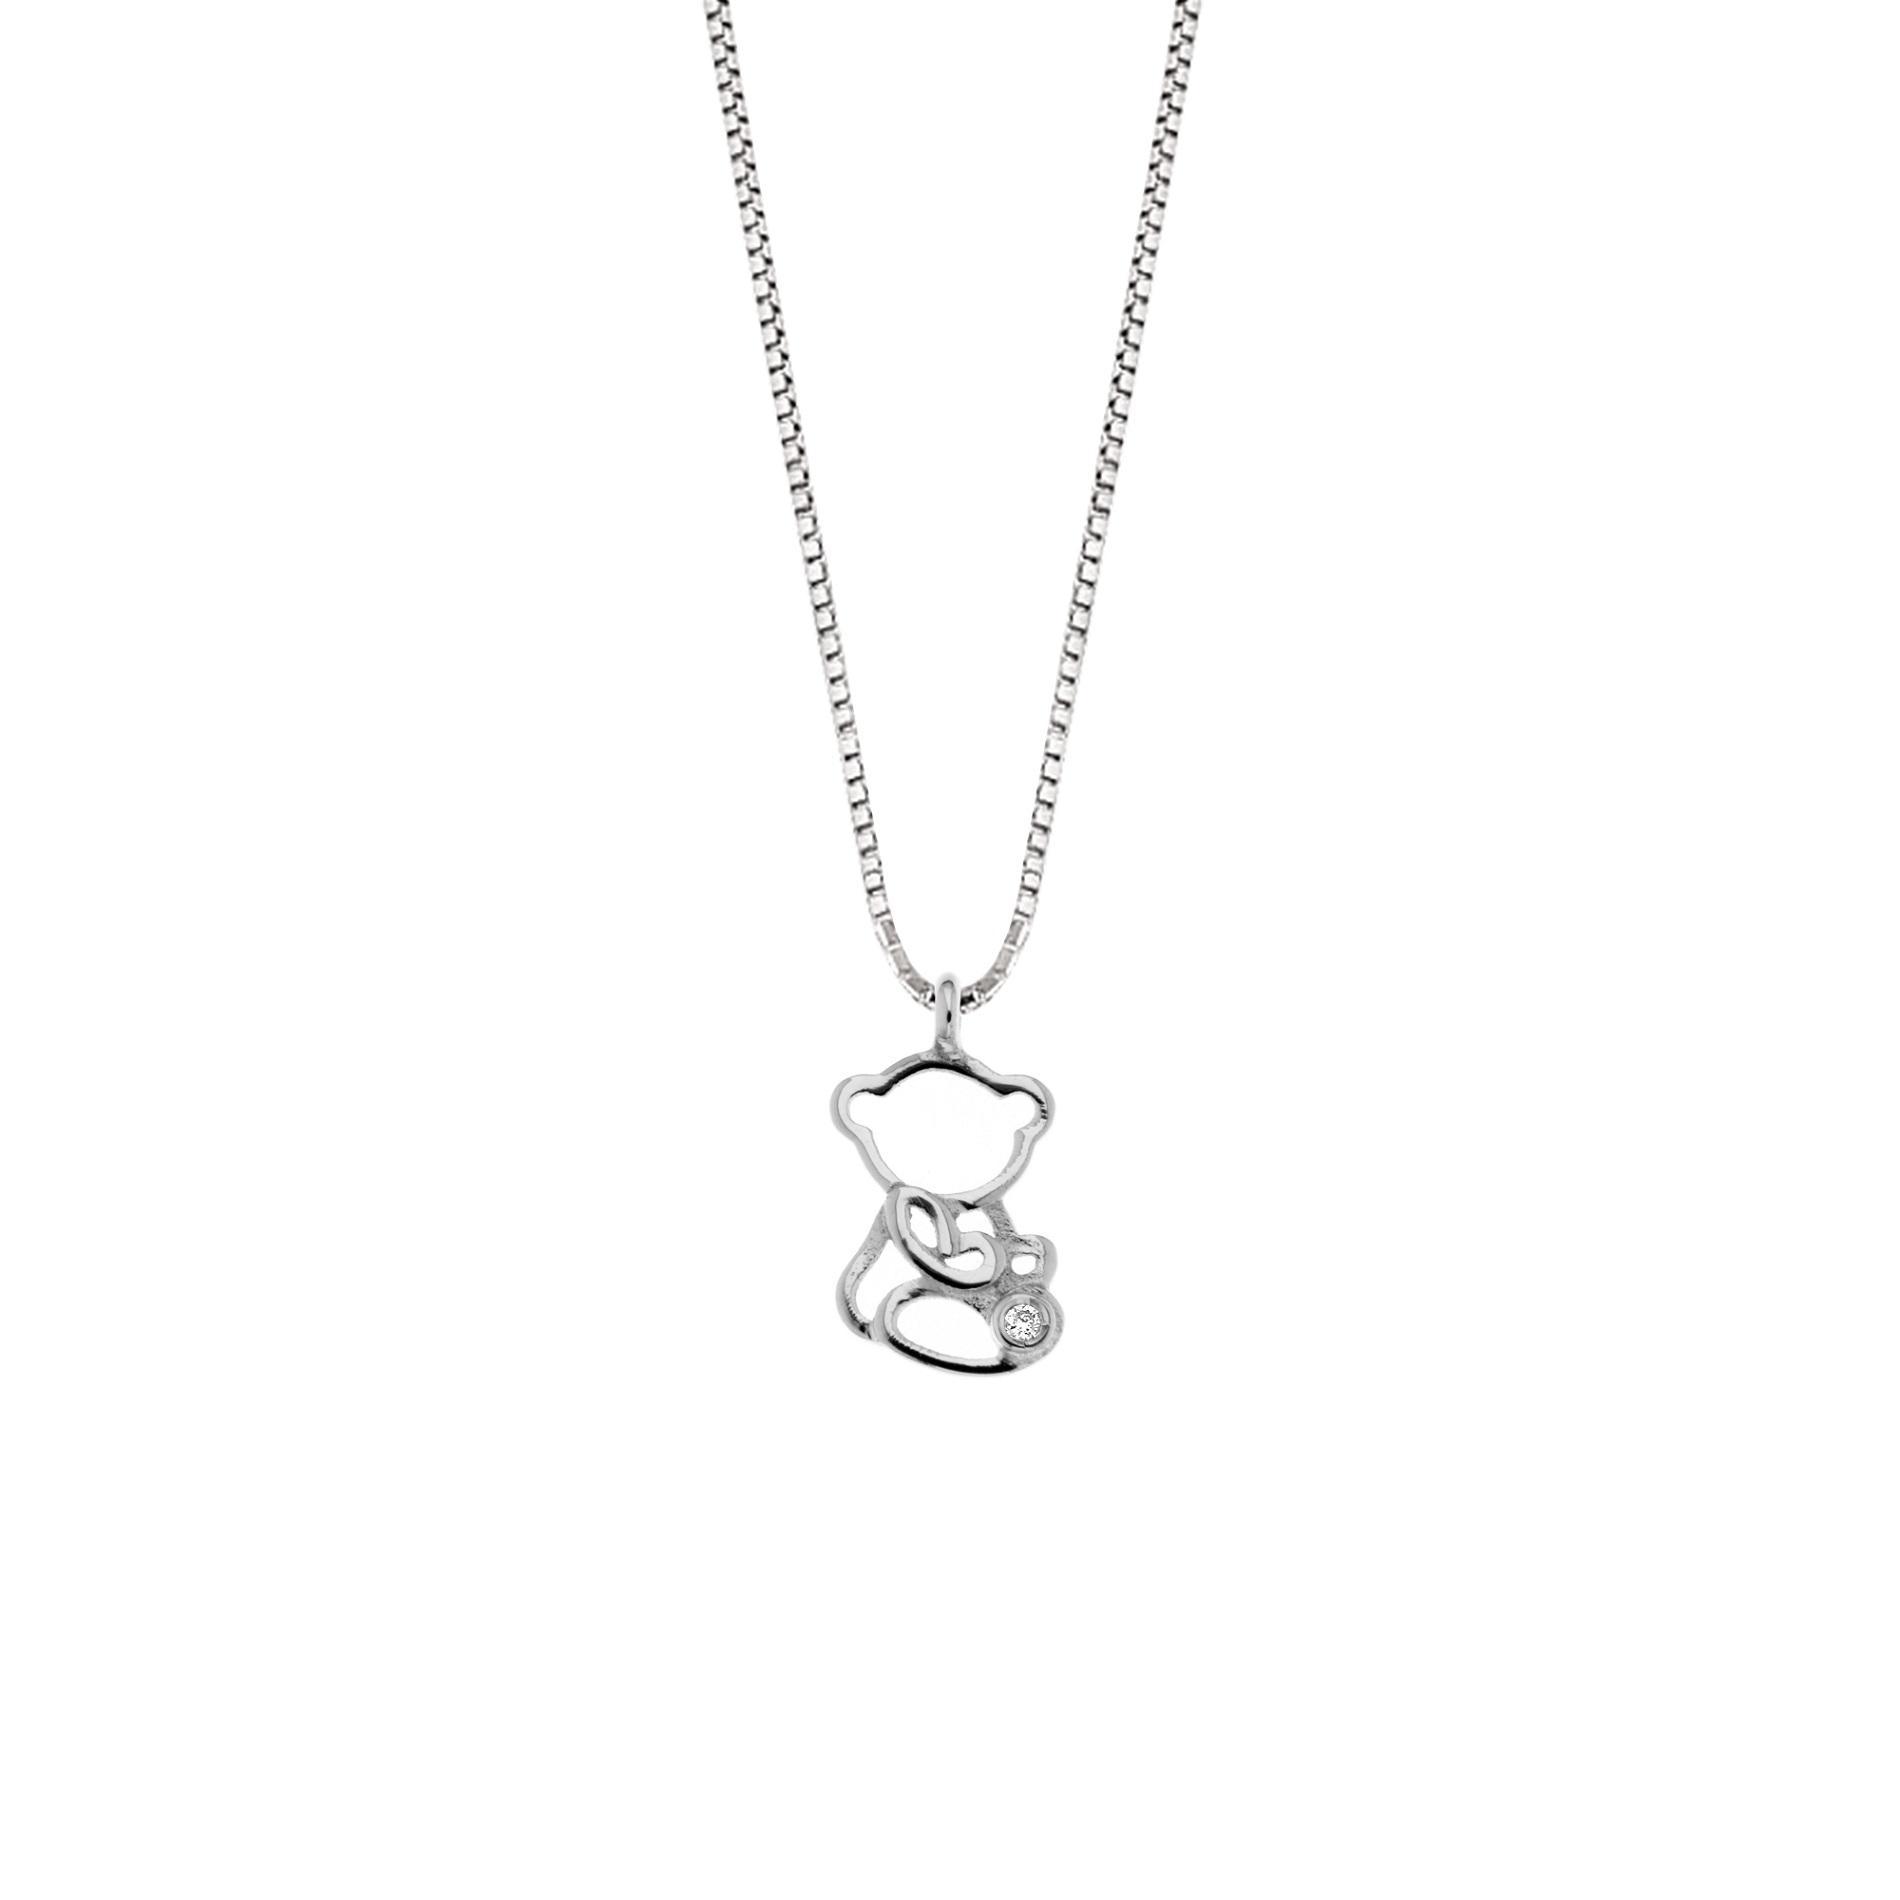 Lantisor din aur 18K cu pandantiv ursulet cu diamant 0,005 ct., model Orsini 0433CI